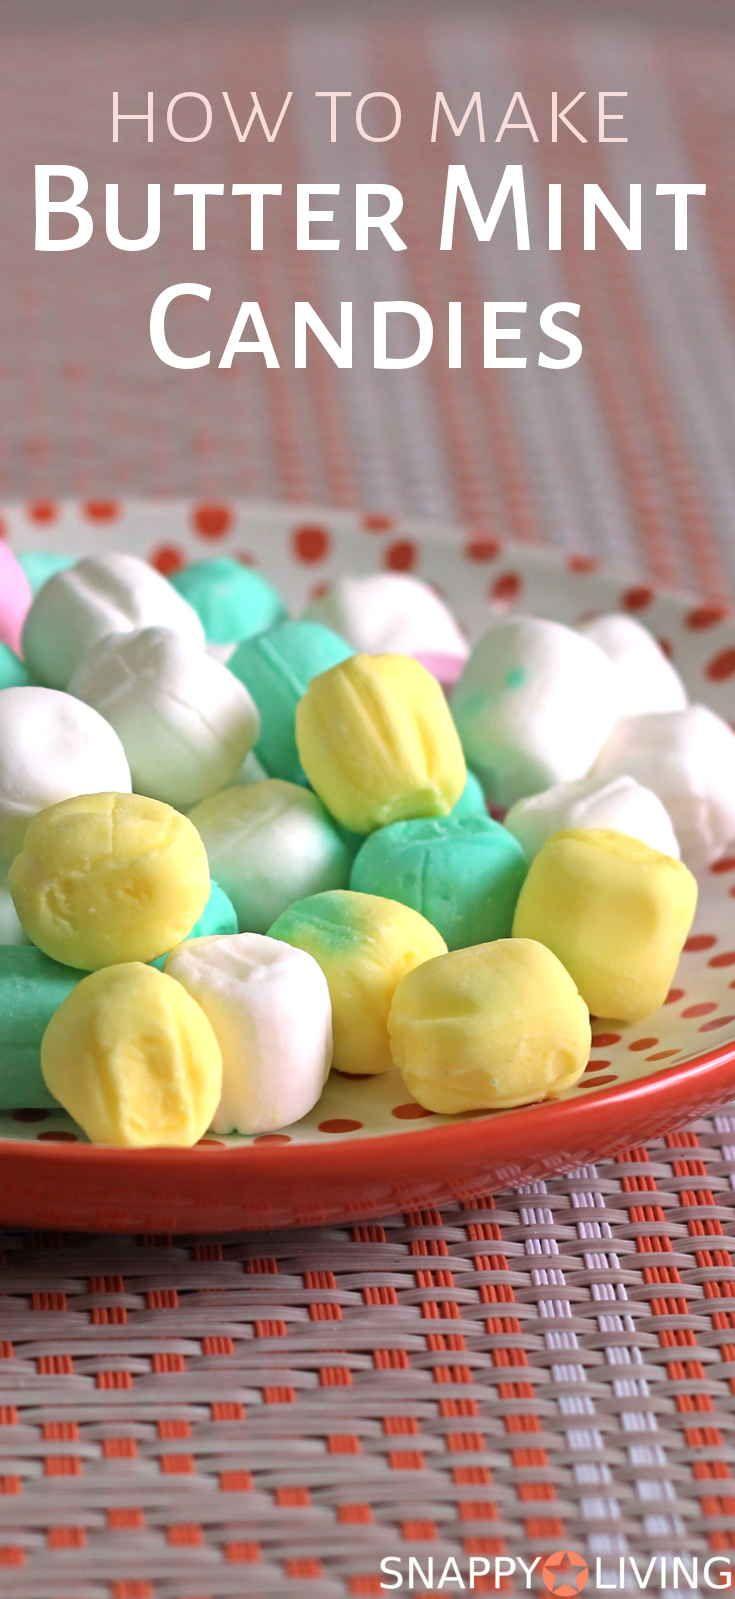 How to Make Homemade Butter Mint Candy | butter mint candy recipe | butter mint candies | #recipes #candy